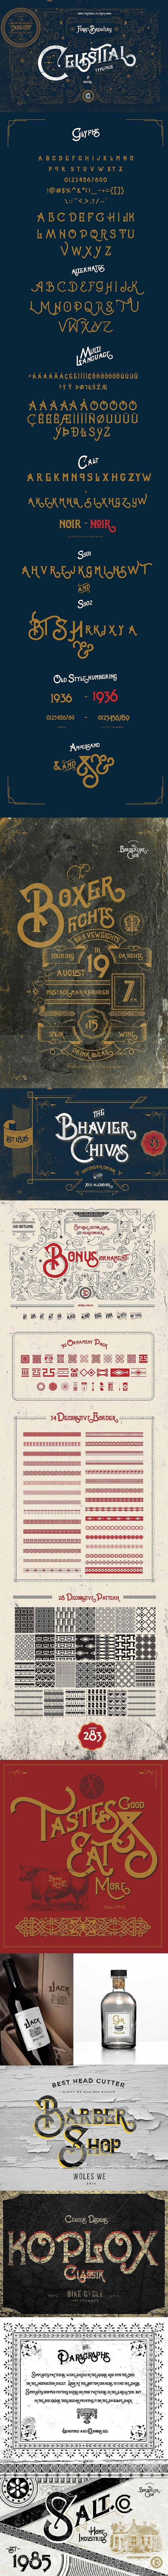 Massive Fonts Bundle! 30 Fonts with Extended License